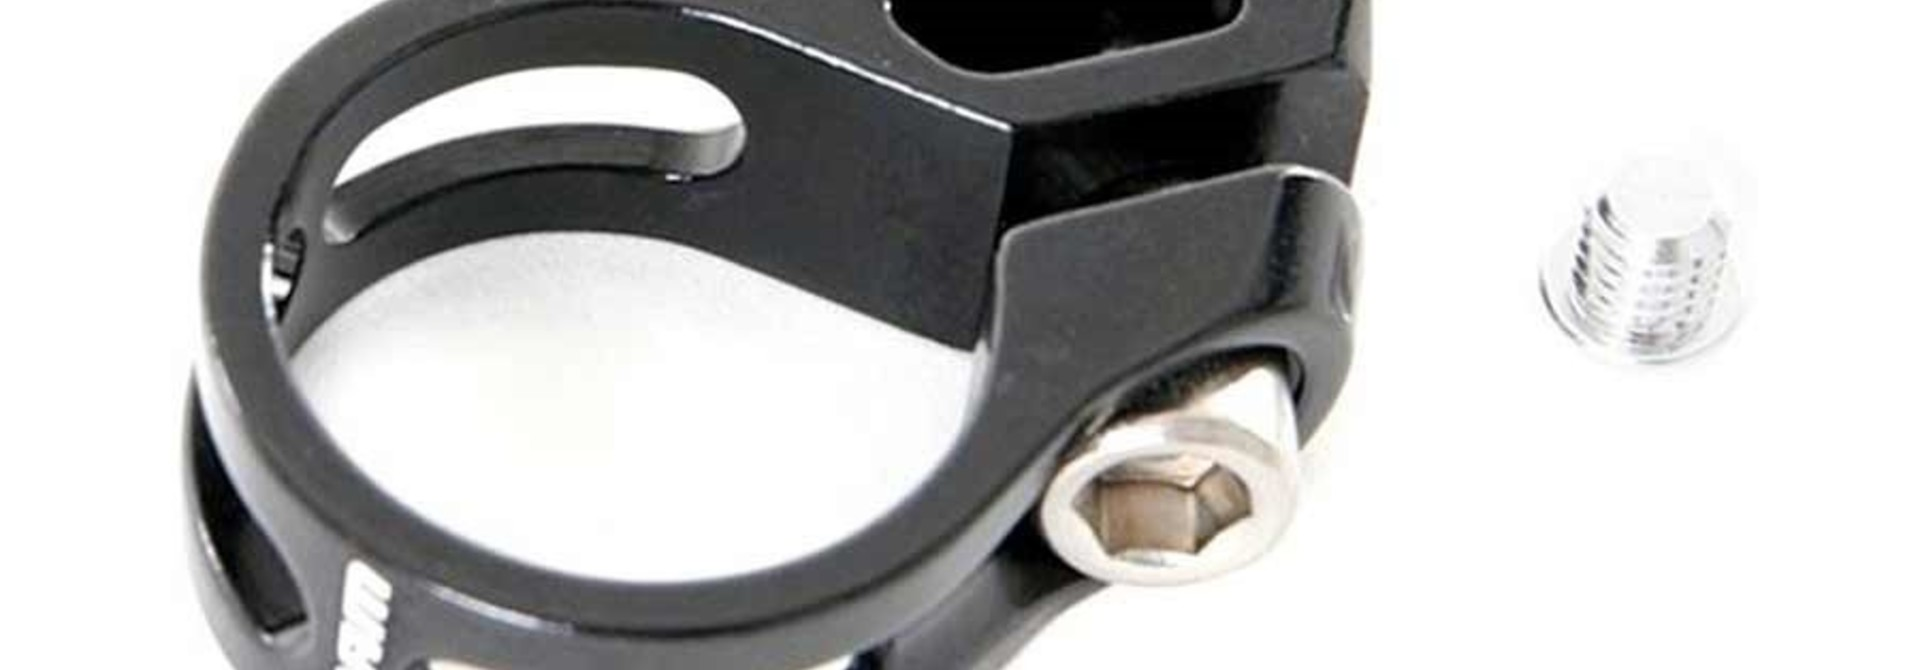 SRAM Trigger Clamp/Bolt Kit Black